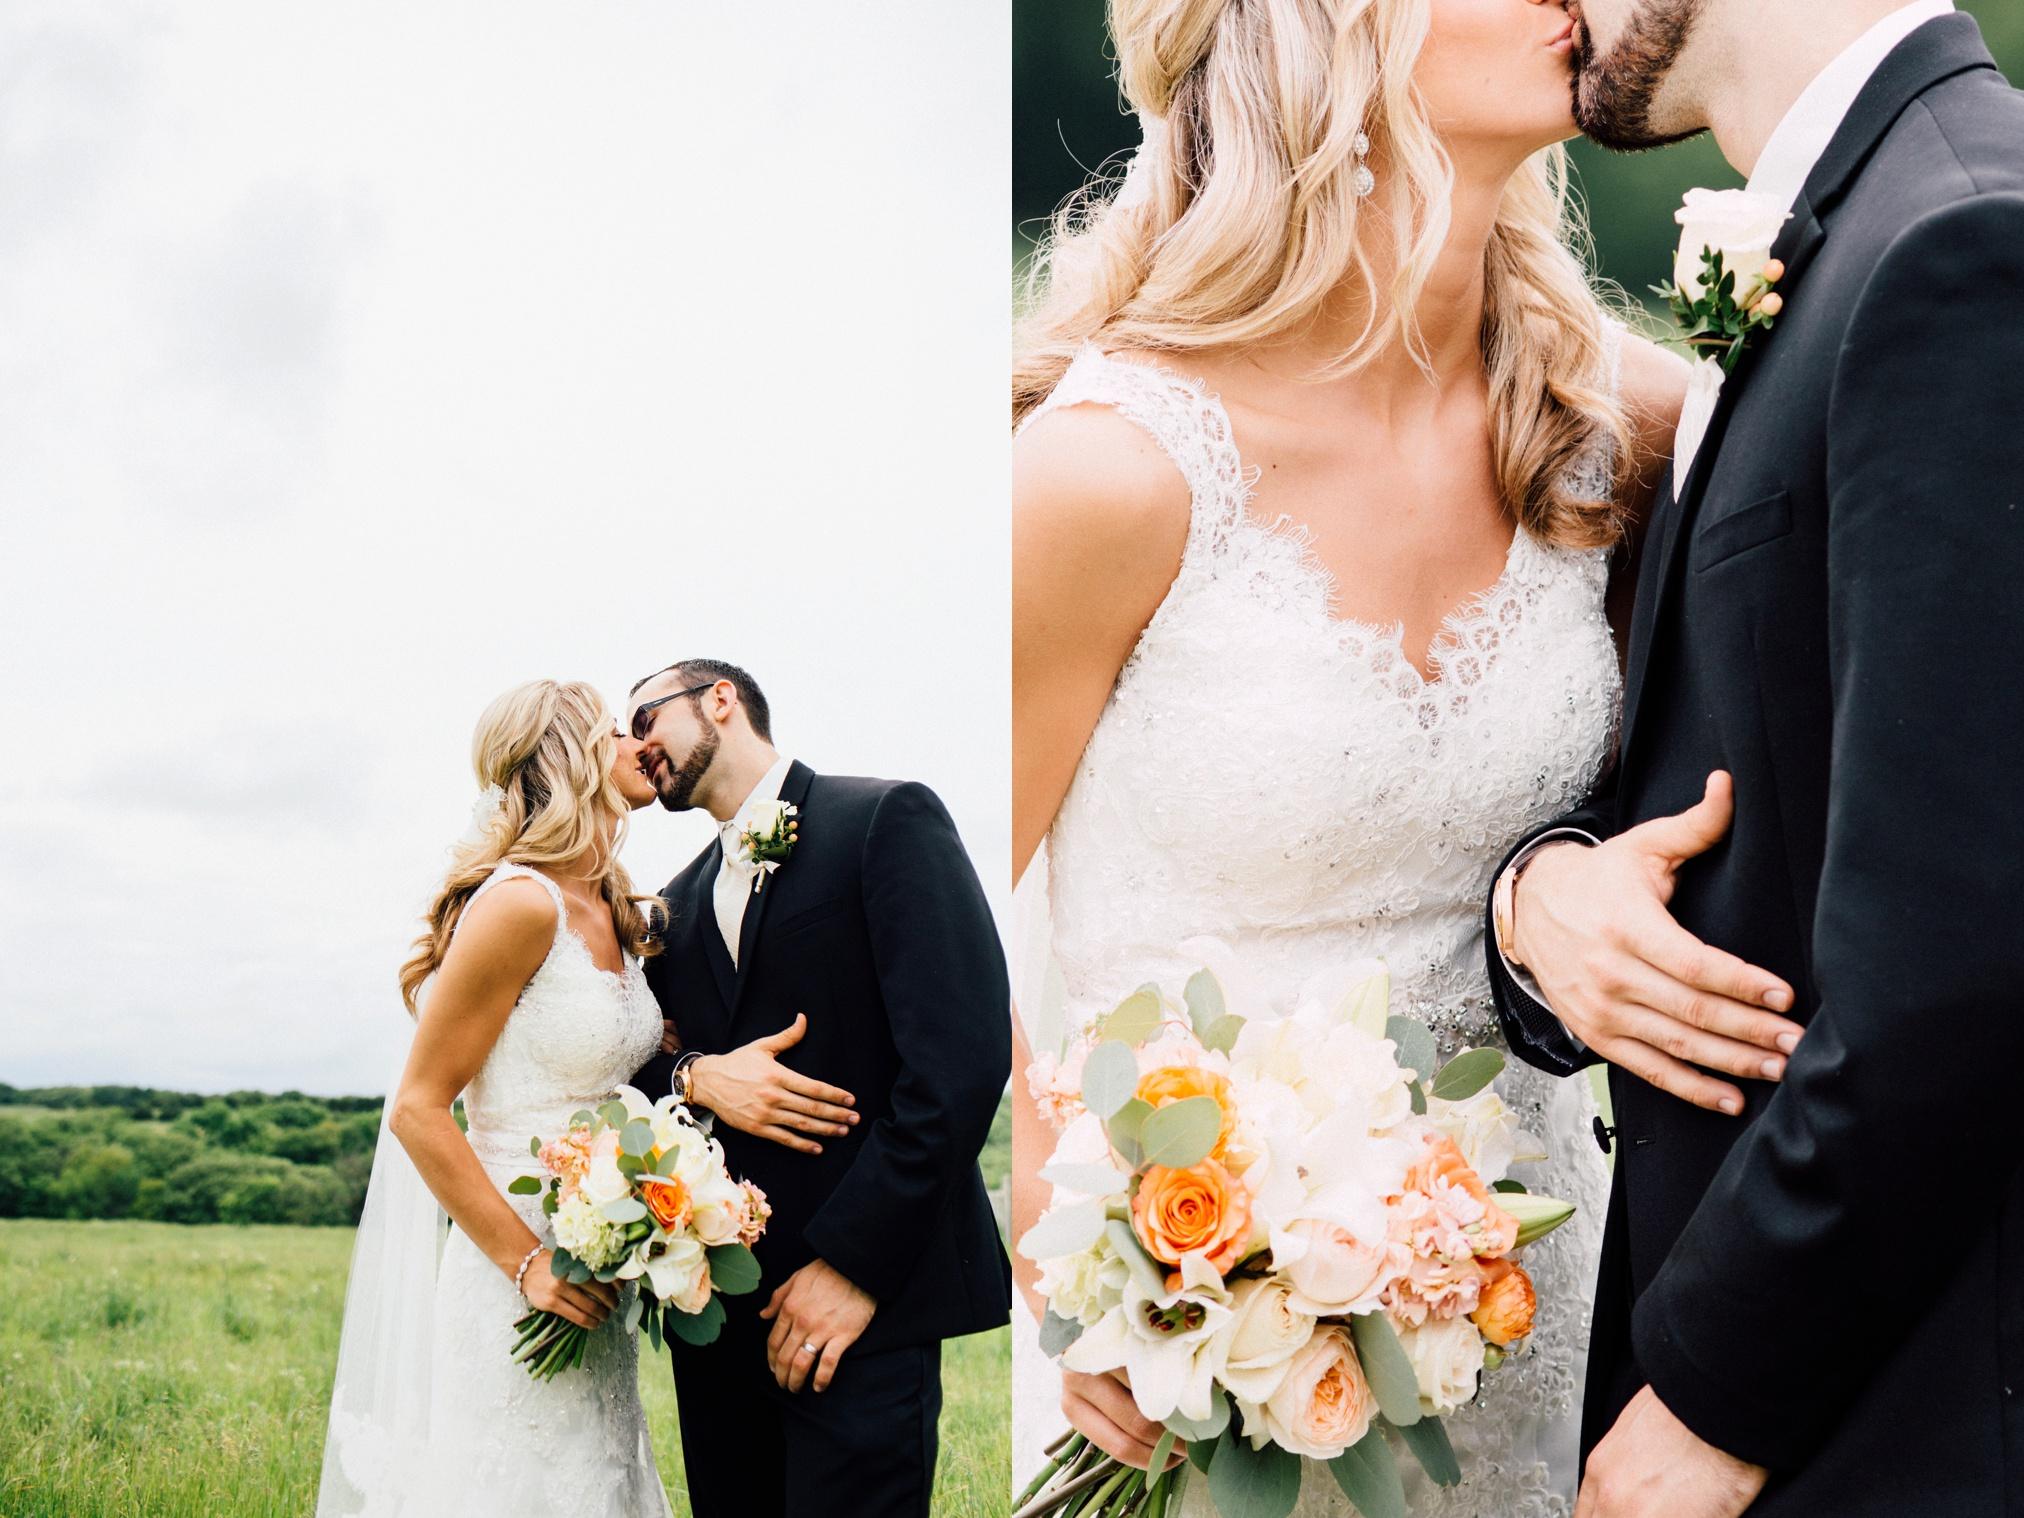 schmid_wedding-632.jpg